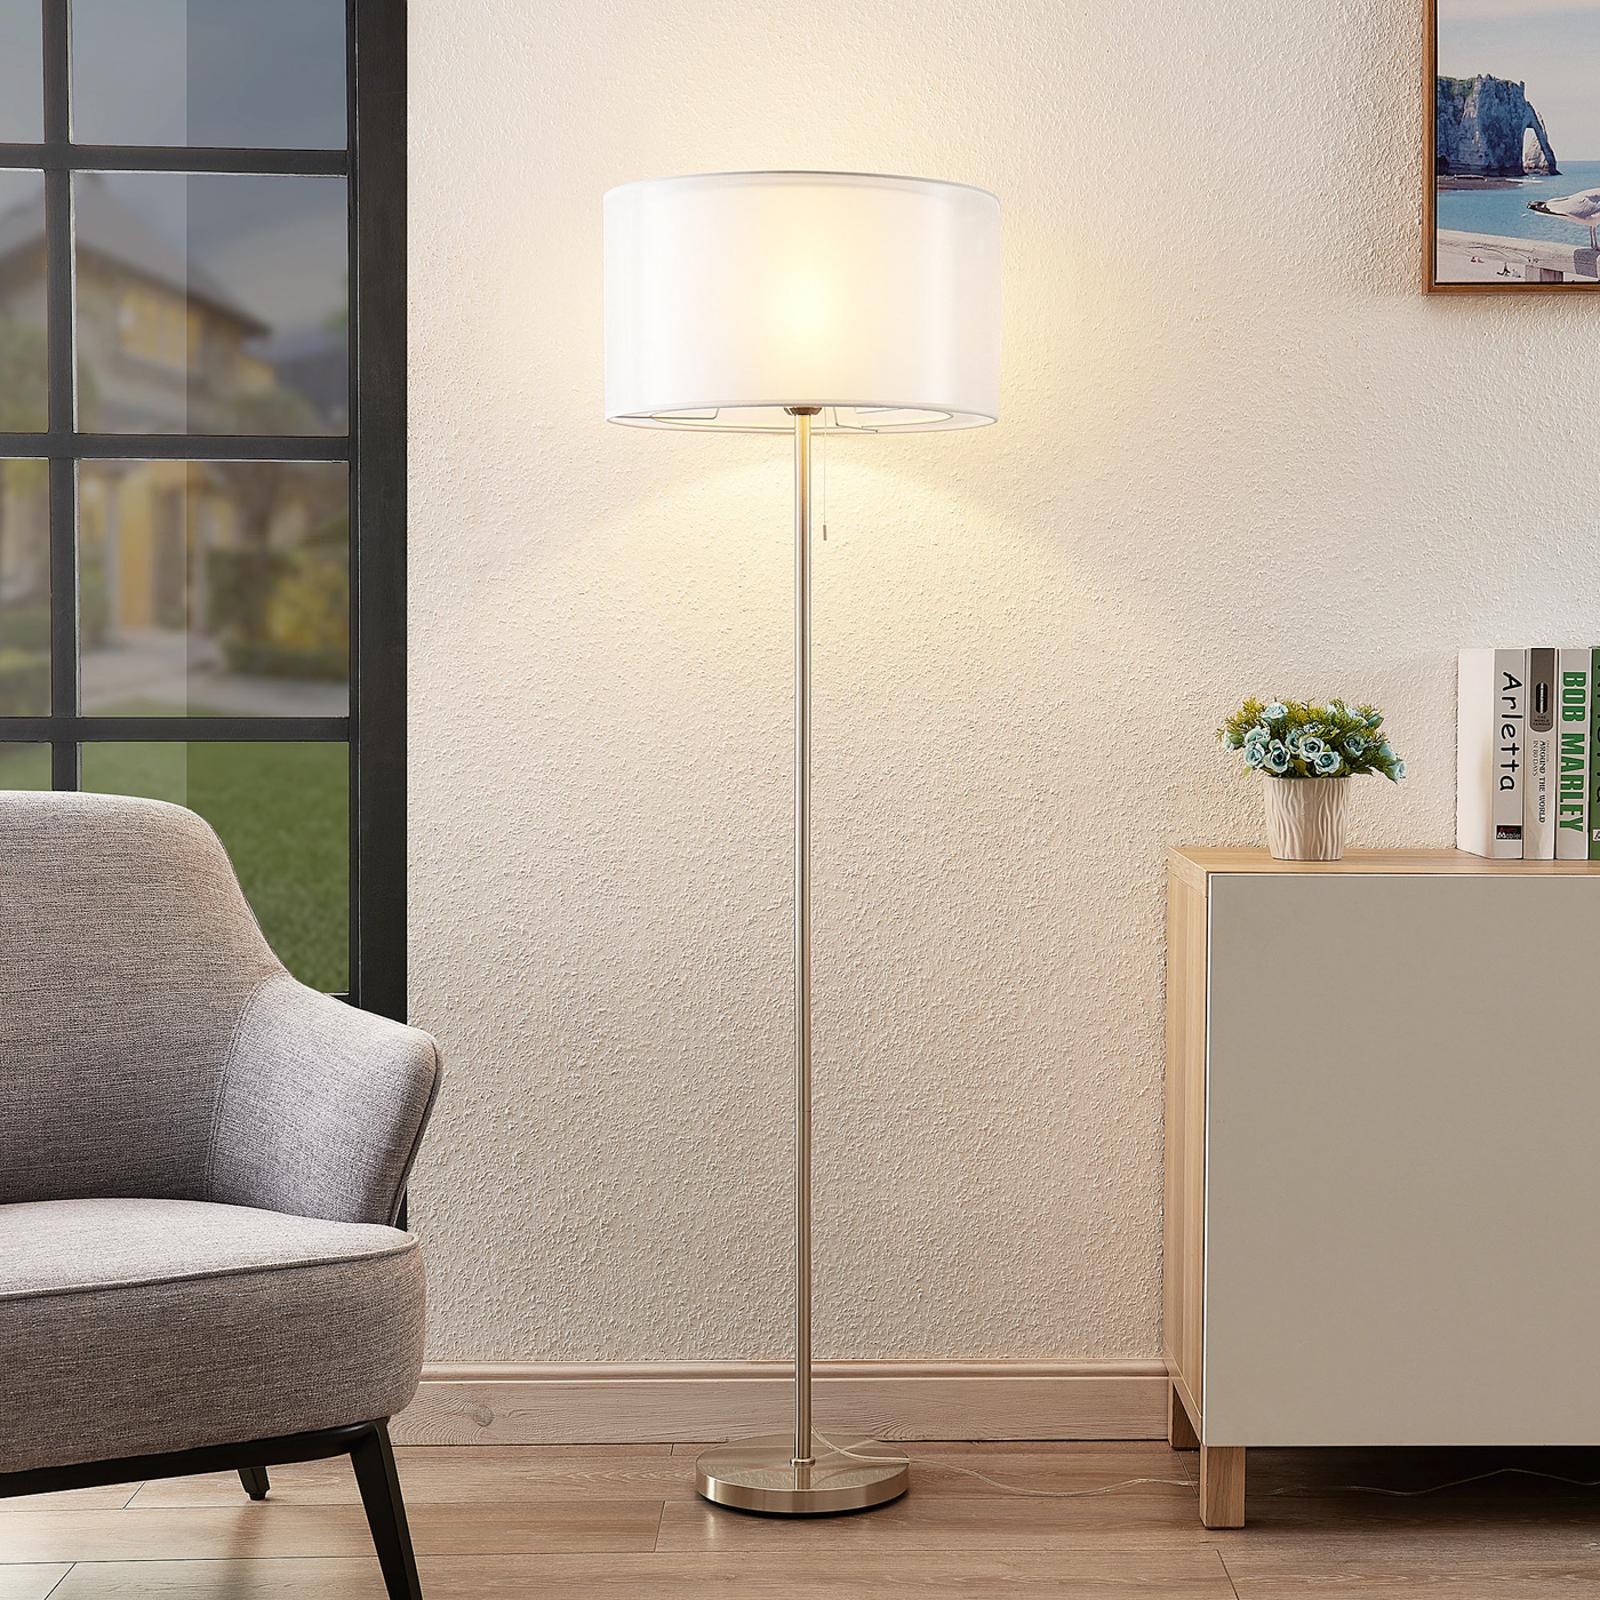 Lindby Taxima lampada da terra, bianco